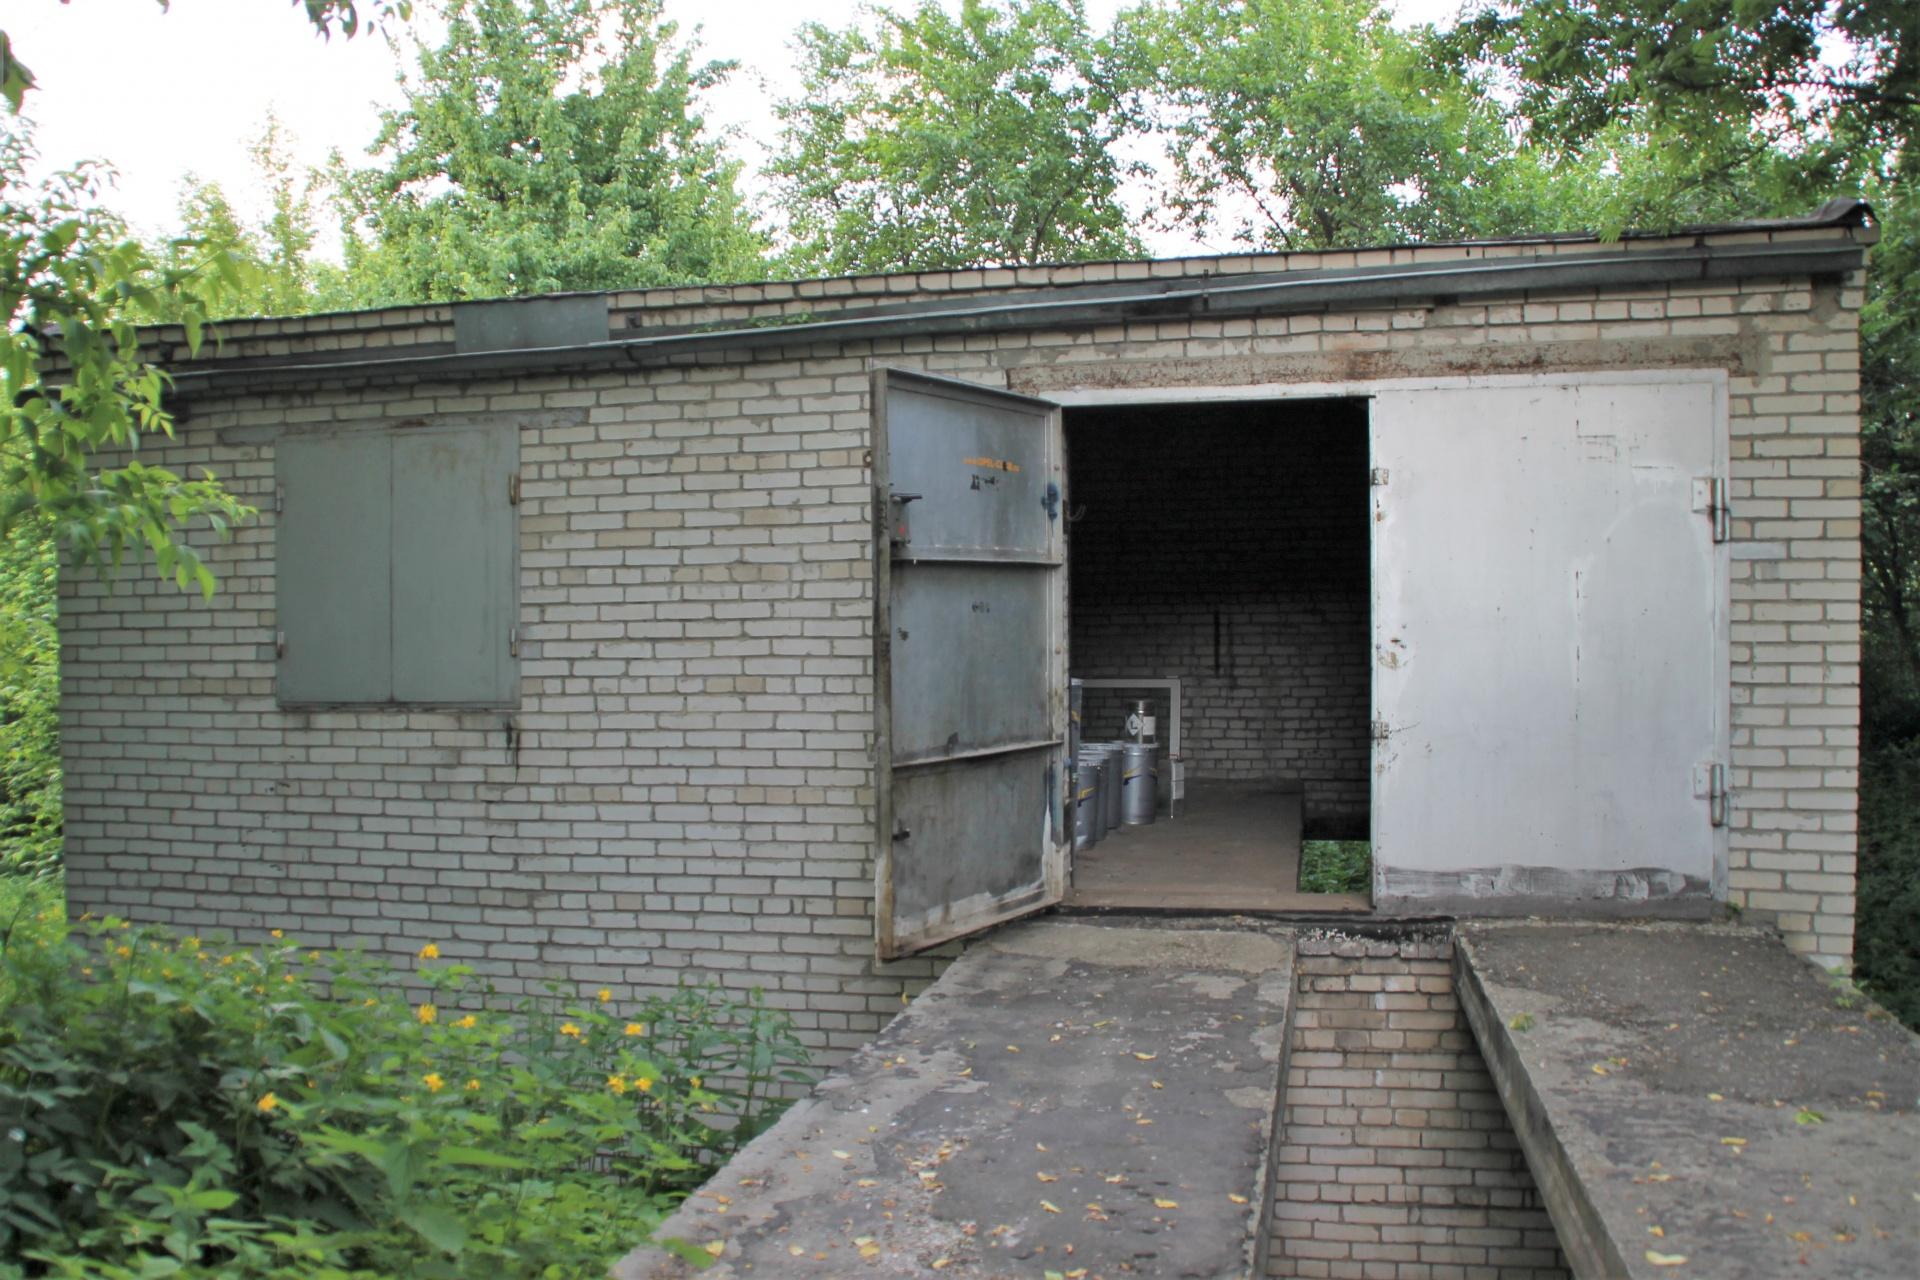 г. Владимир, Тракторная ул., гараж на продажу